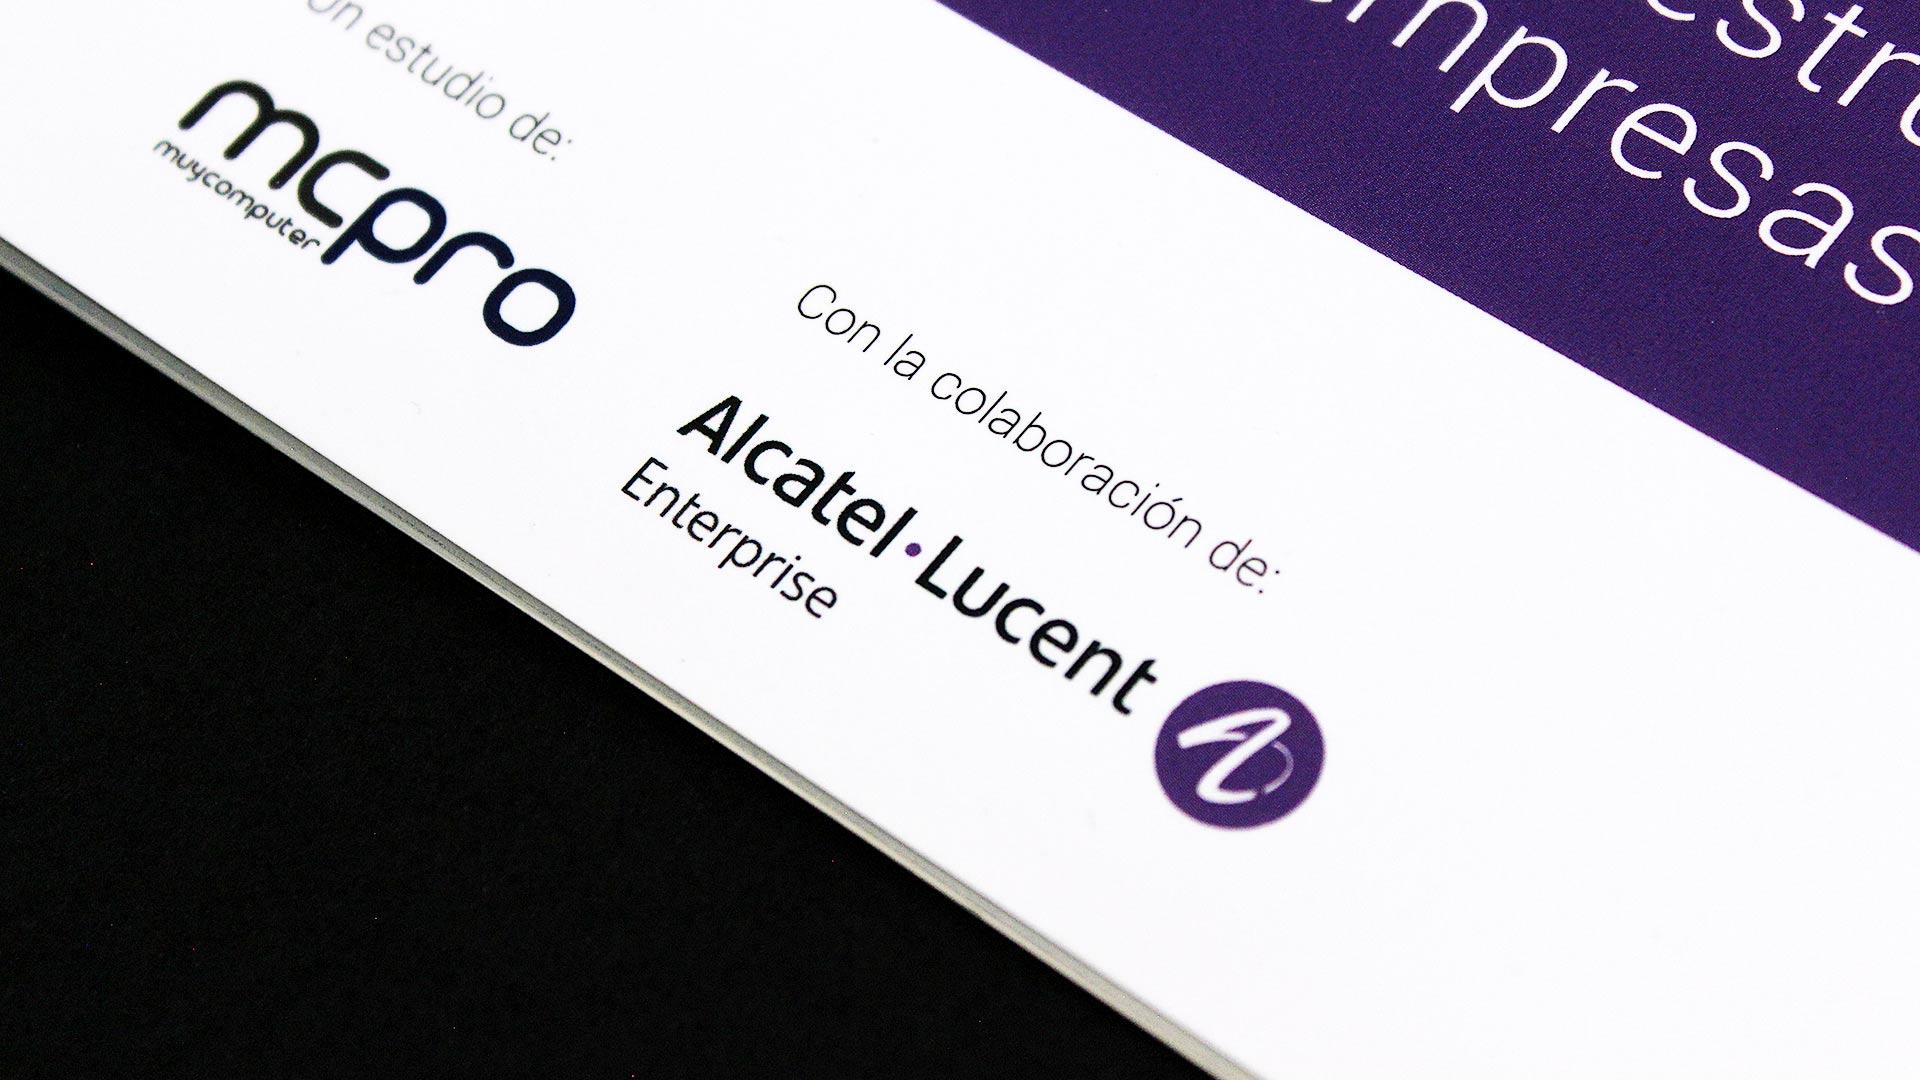 alcatel-content-marketing-informe-resumen-ejecutivo-networkondemand-ebook-2016-09